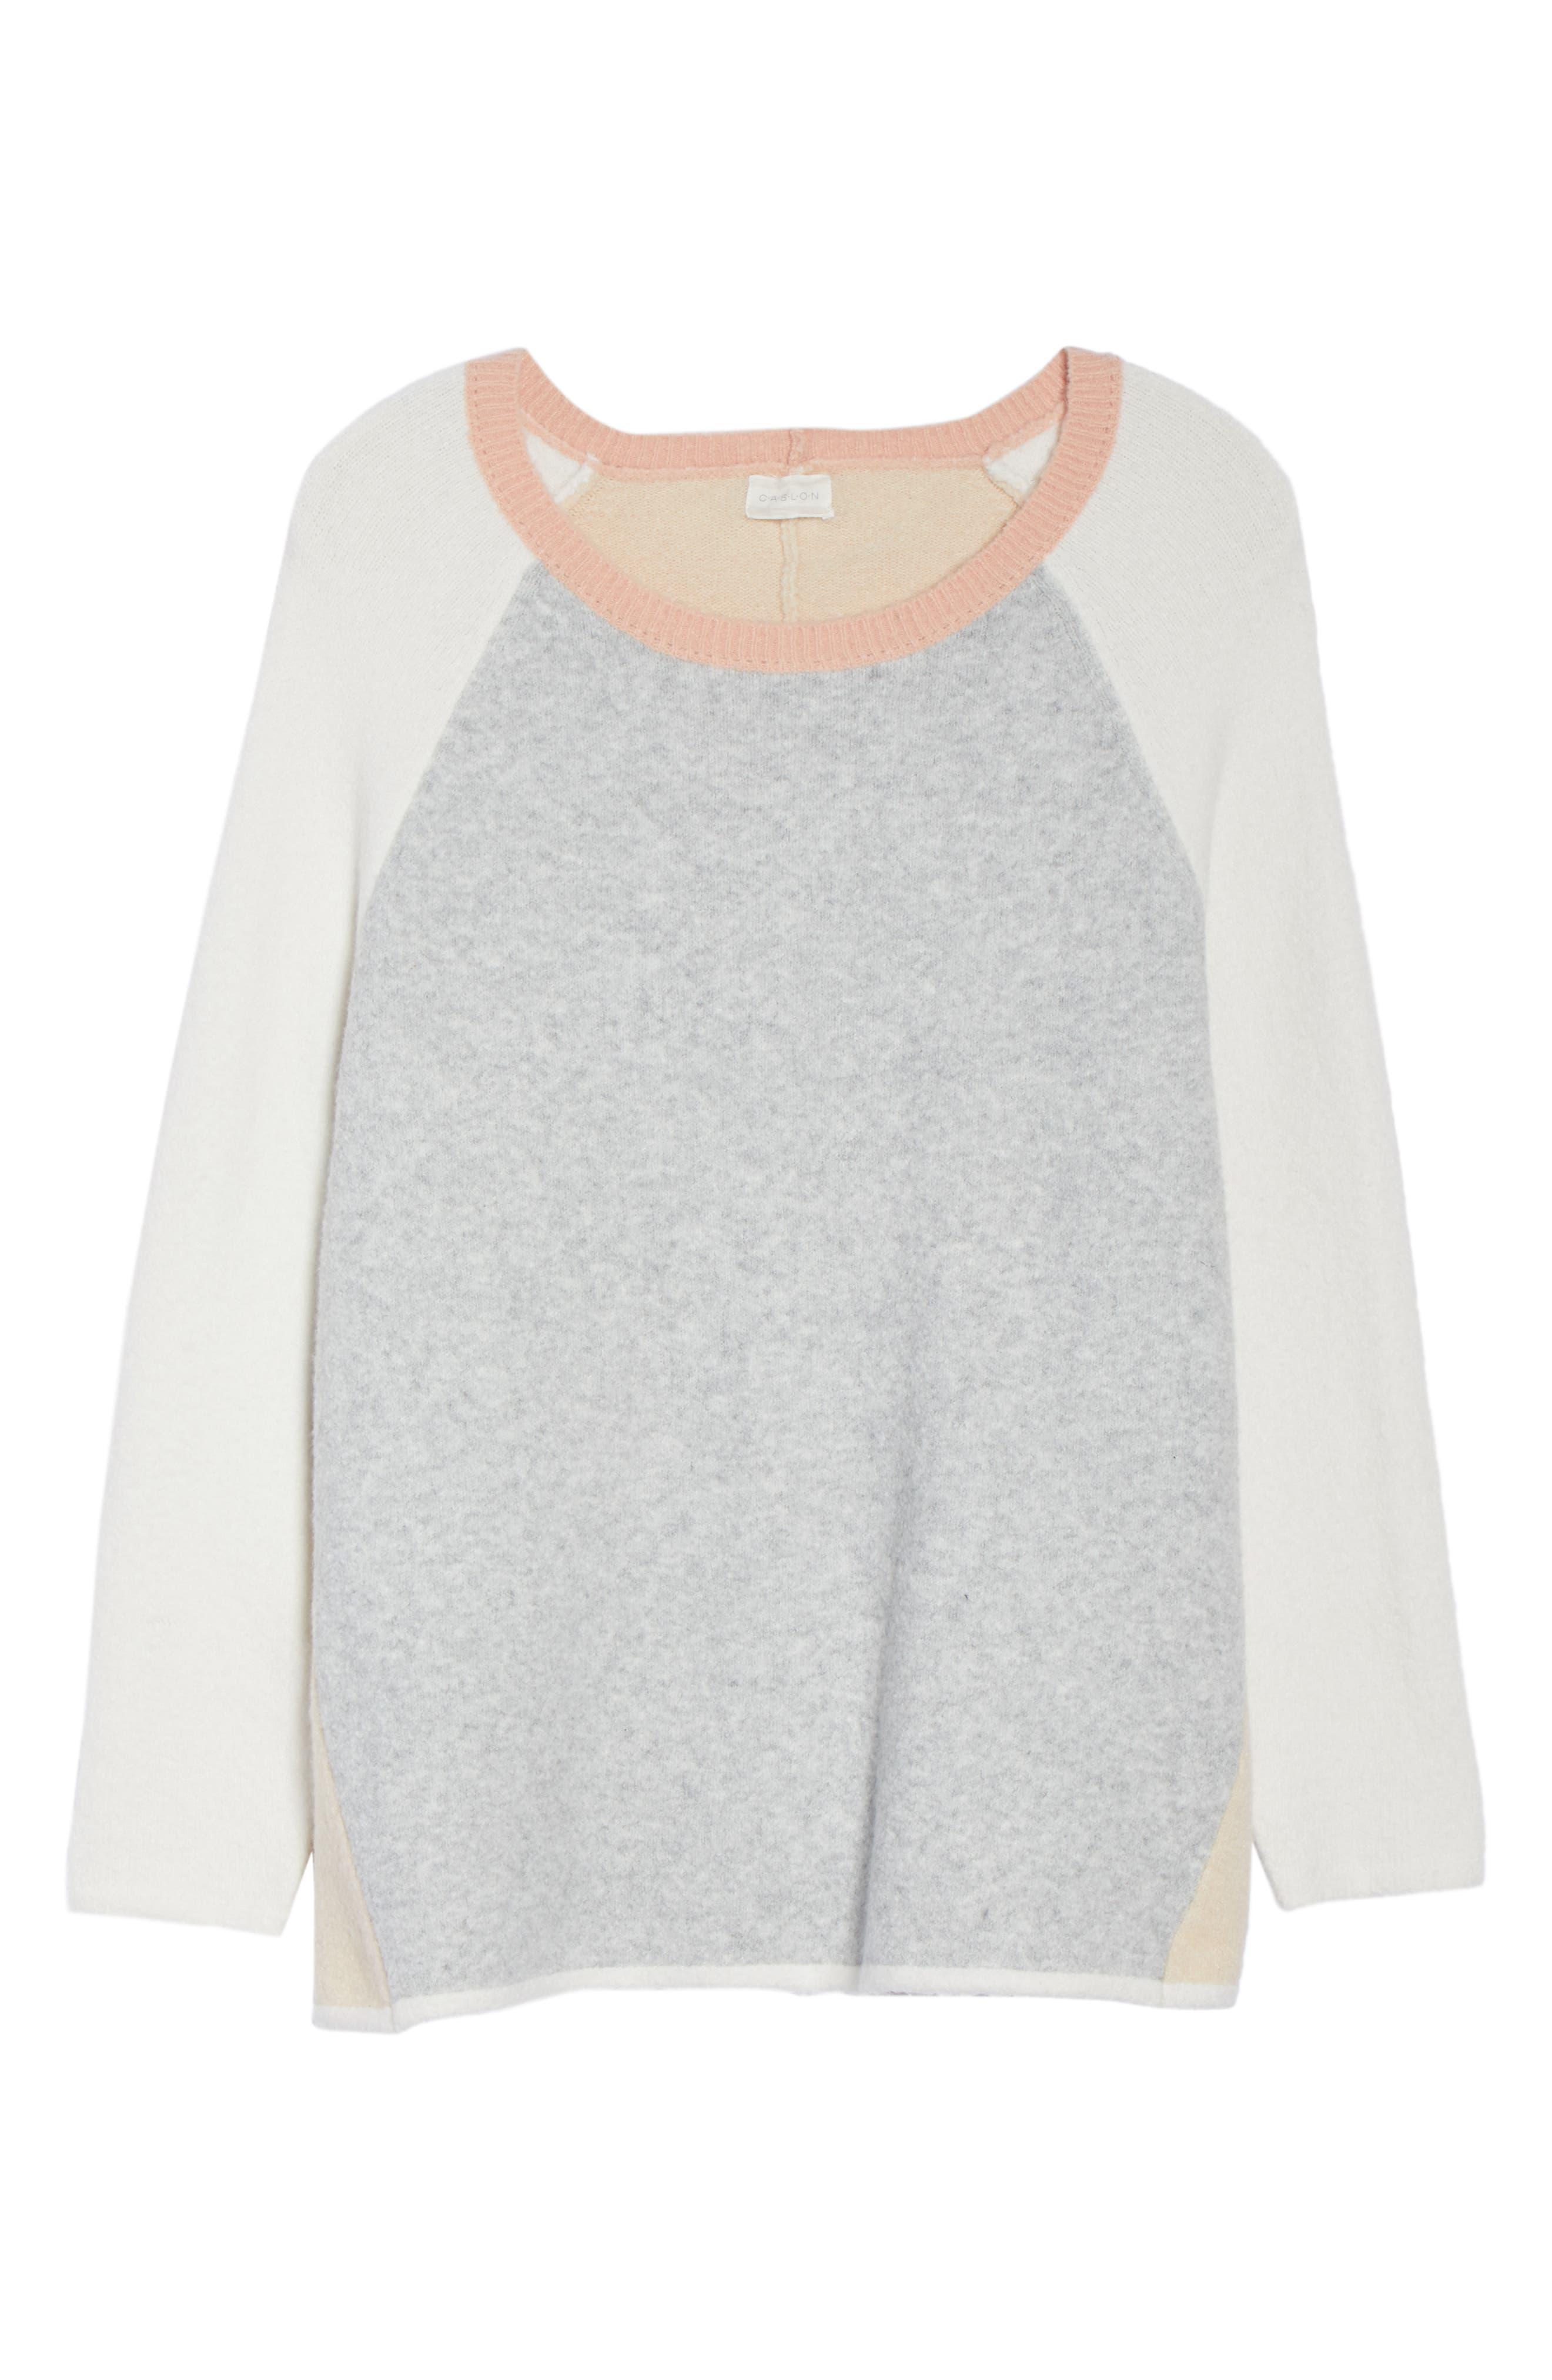 Colorblock Sweater,                             Alternate thumbnail 6, color,                             GREY LT HEATHER CB